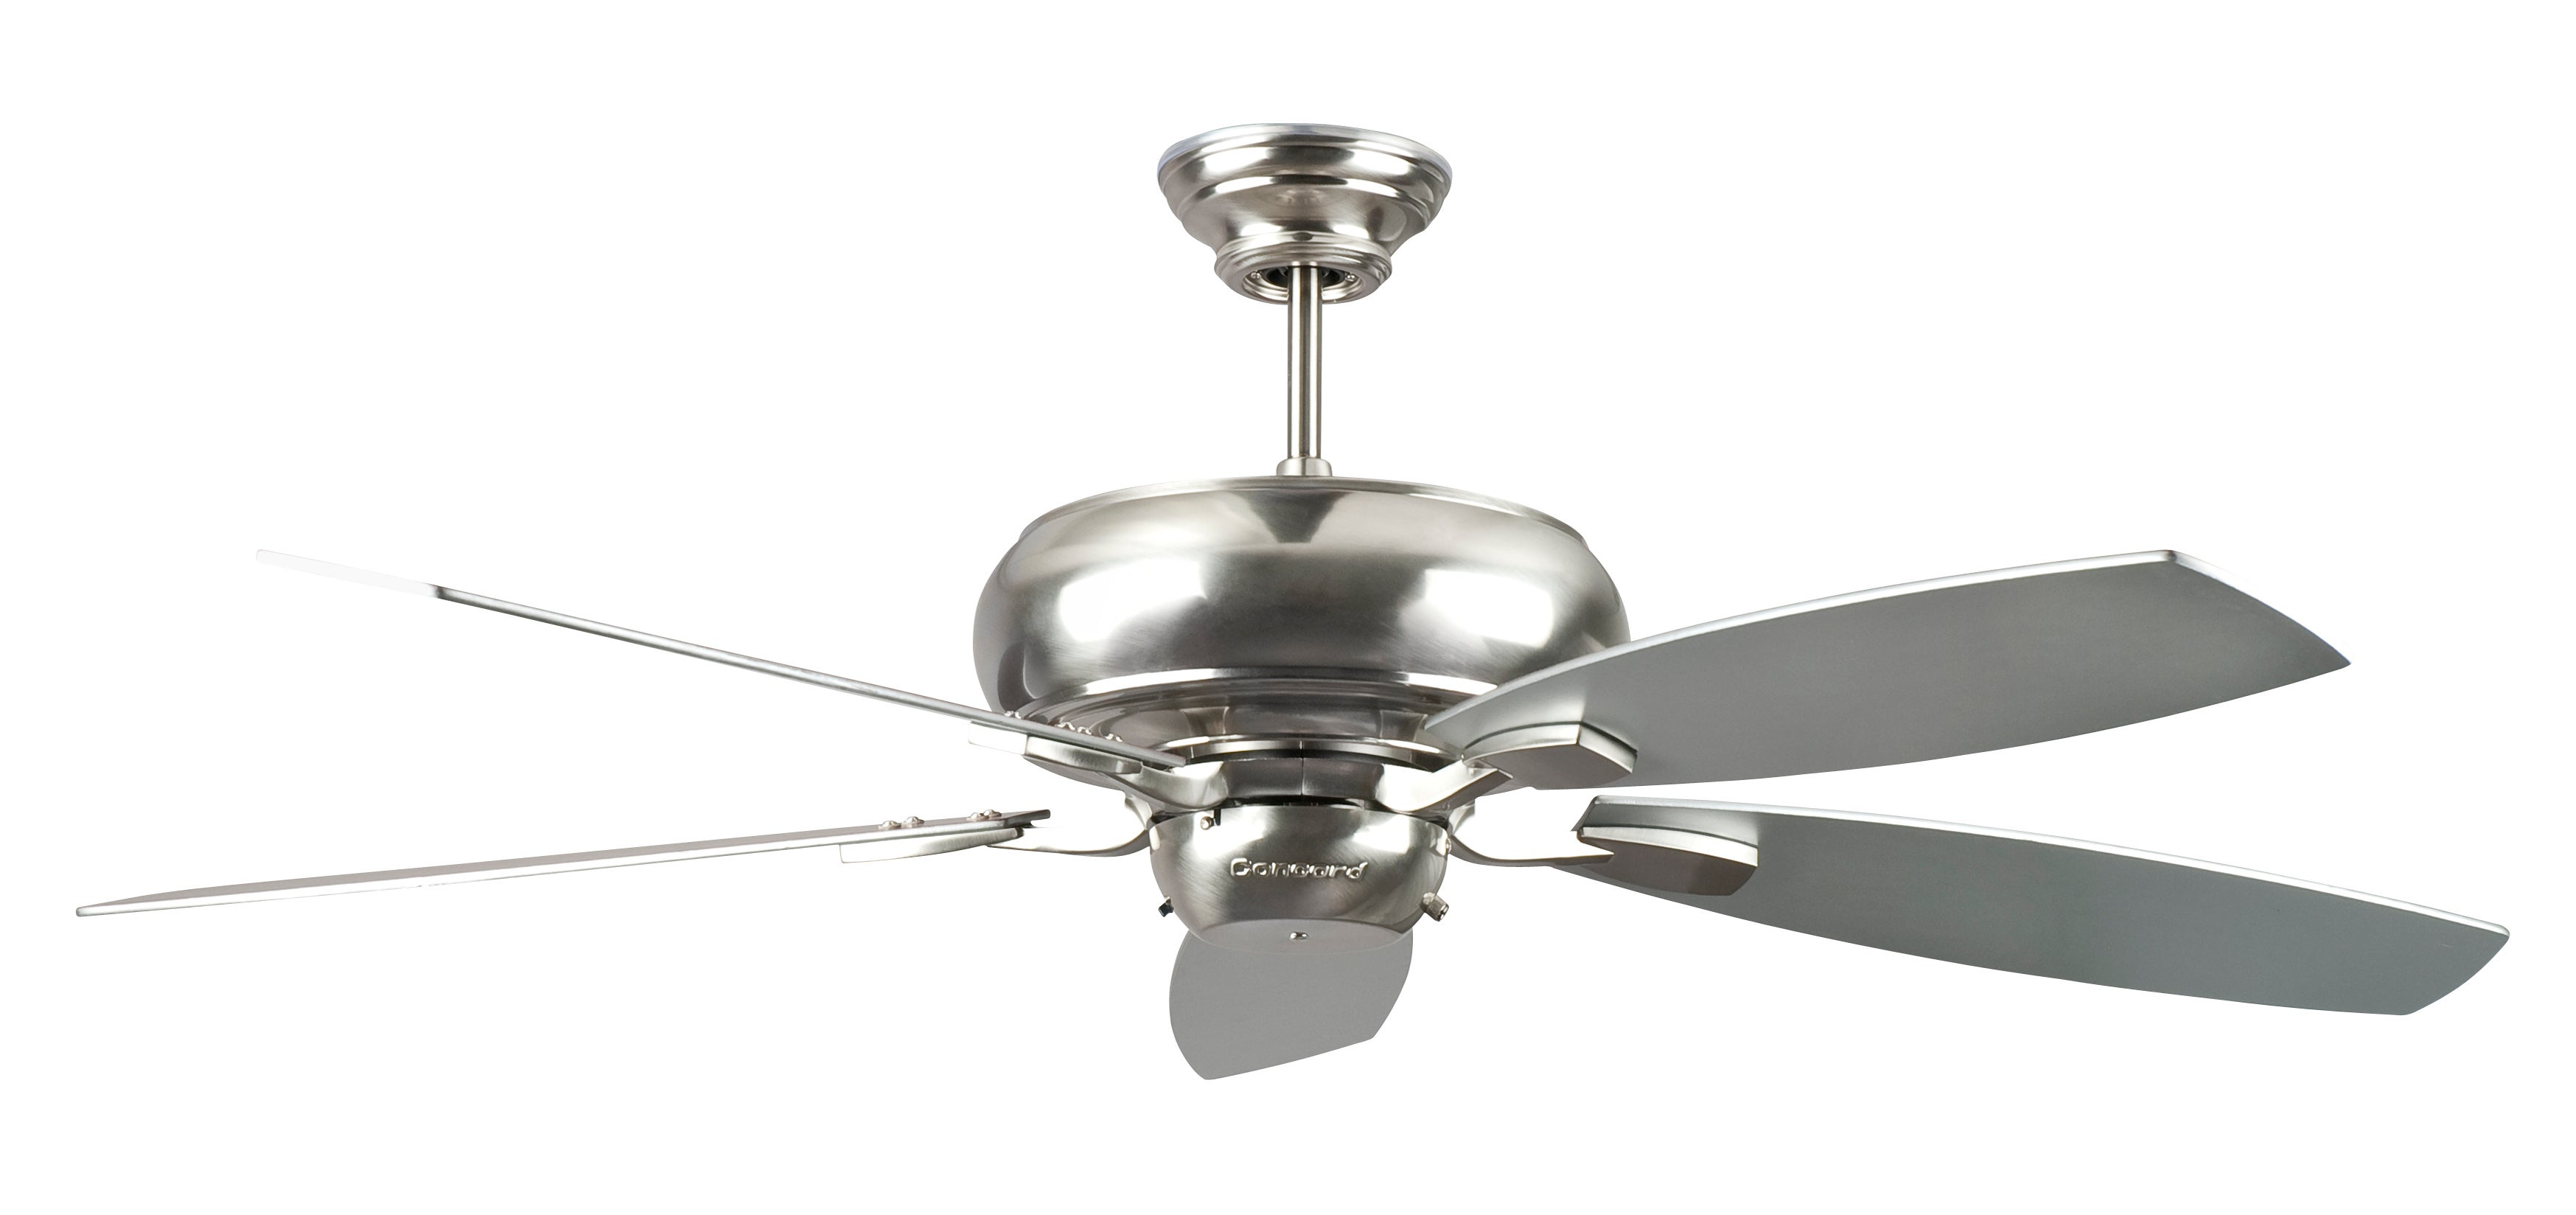 52-Inch Stainless Steel Five Blade Ceiling Fan